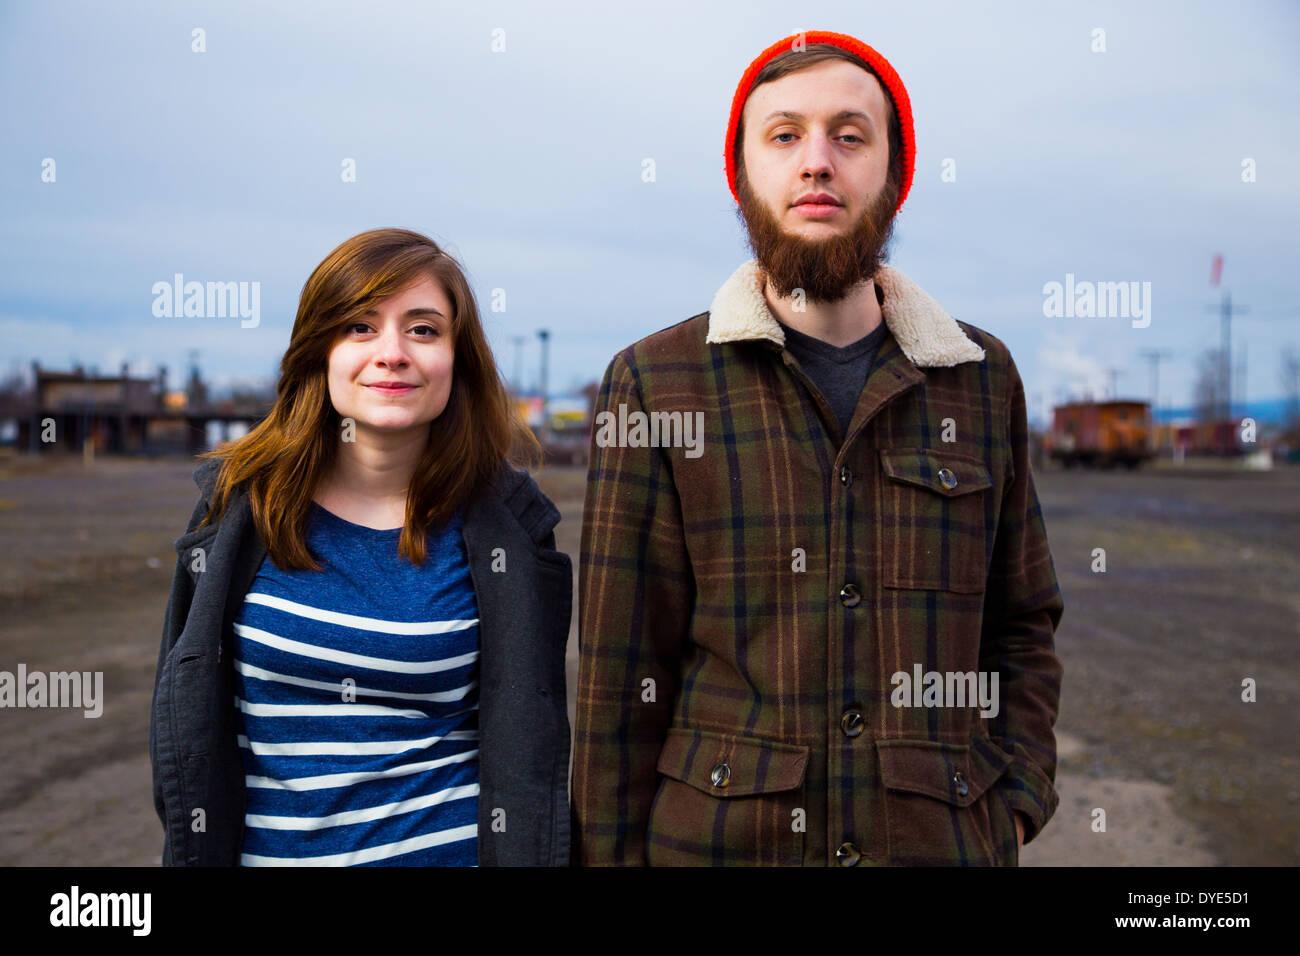 Modernos, hipster par en un patio de trenes abandonados al atardecer en este retrato de estilo de moda. Imagen De Stock